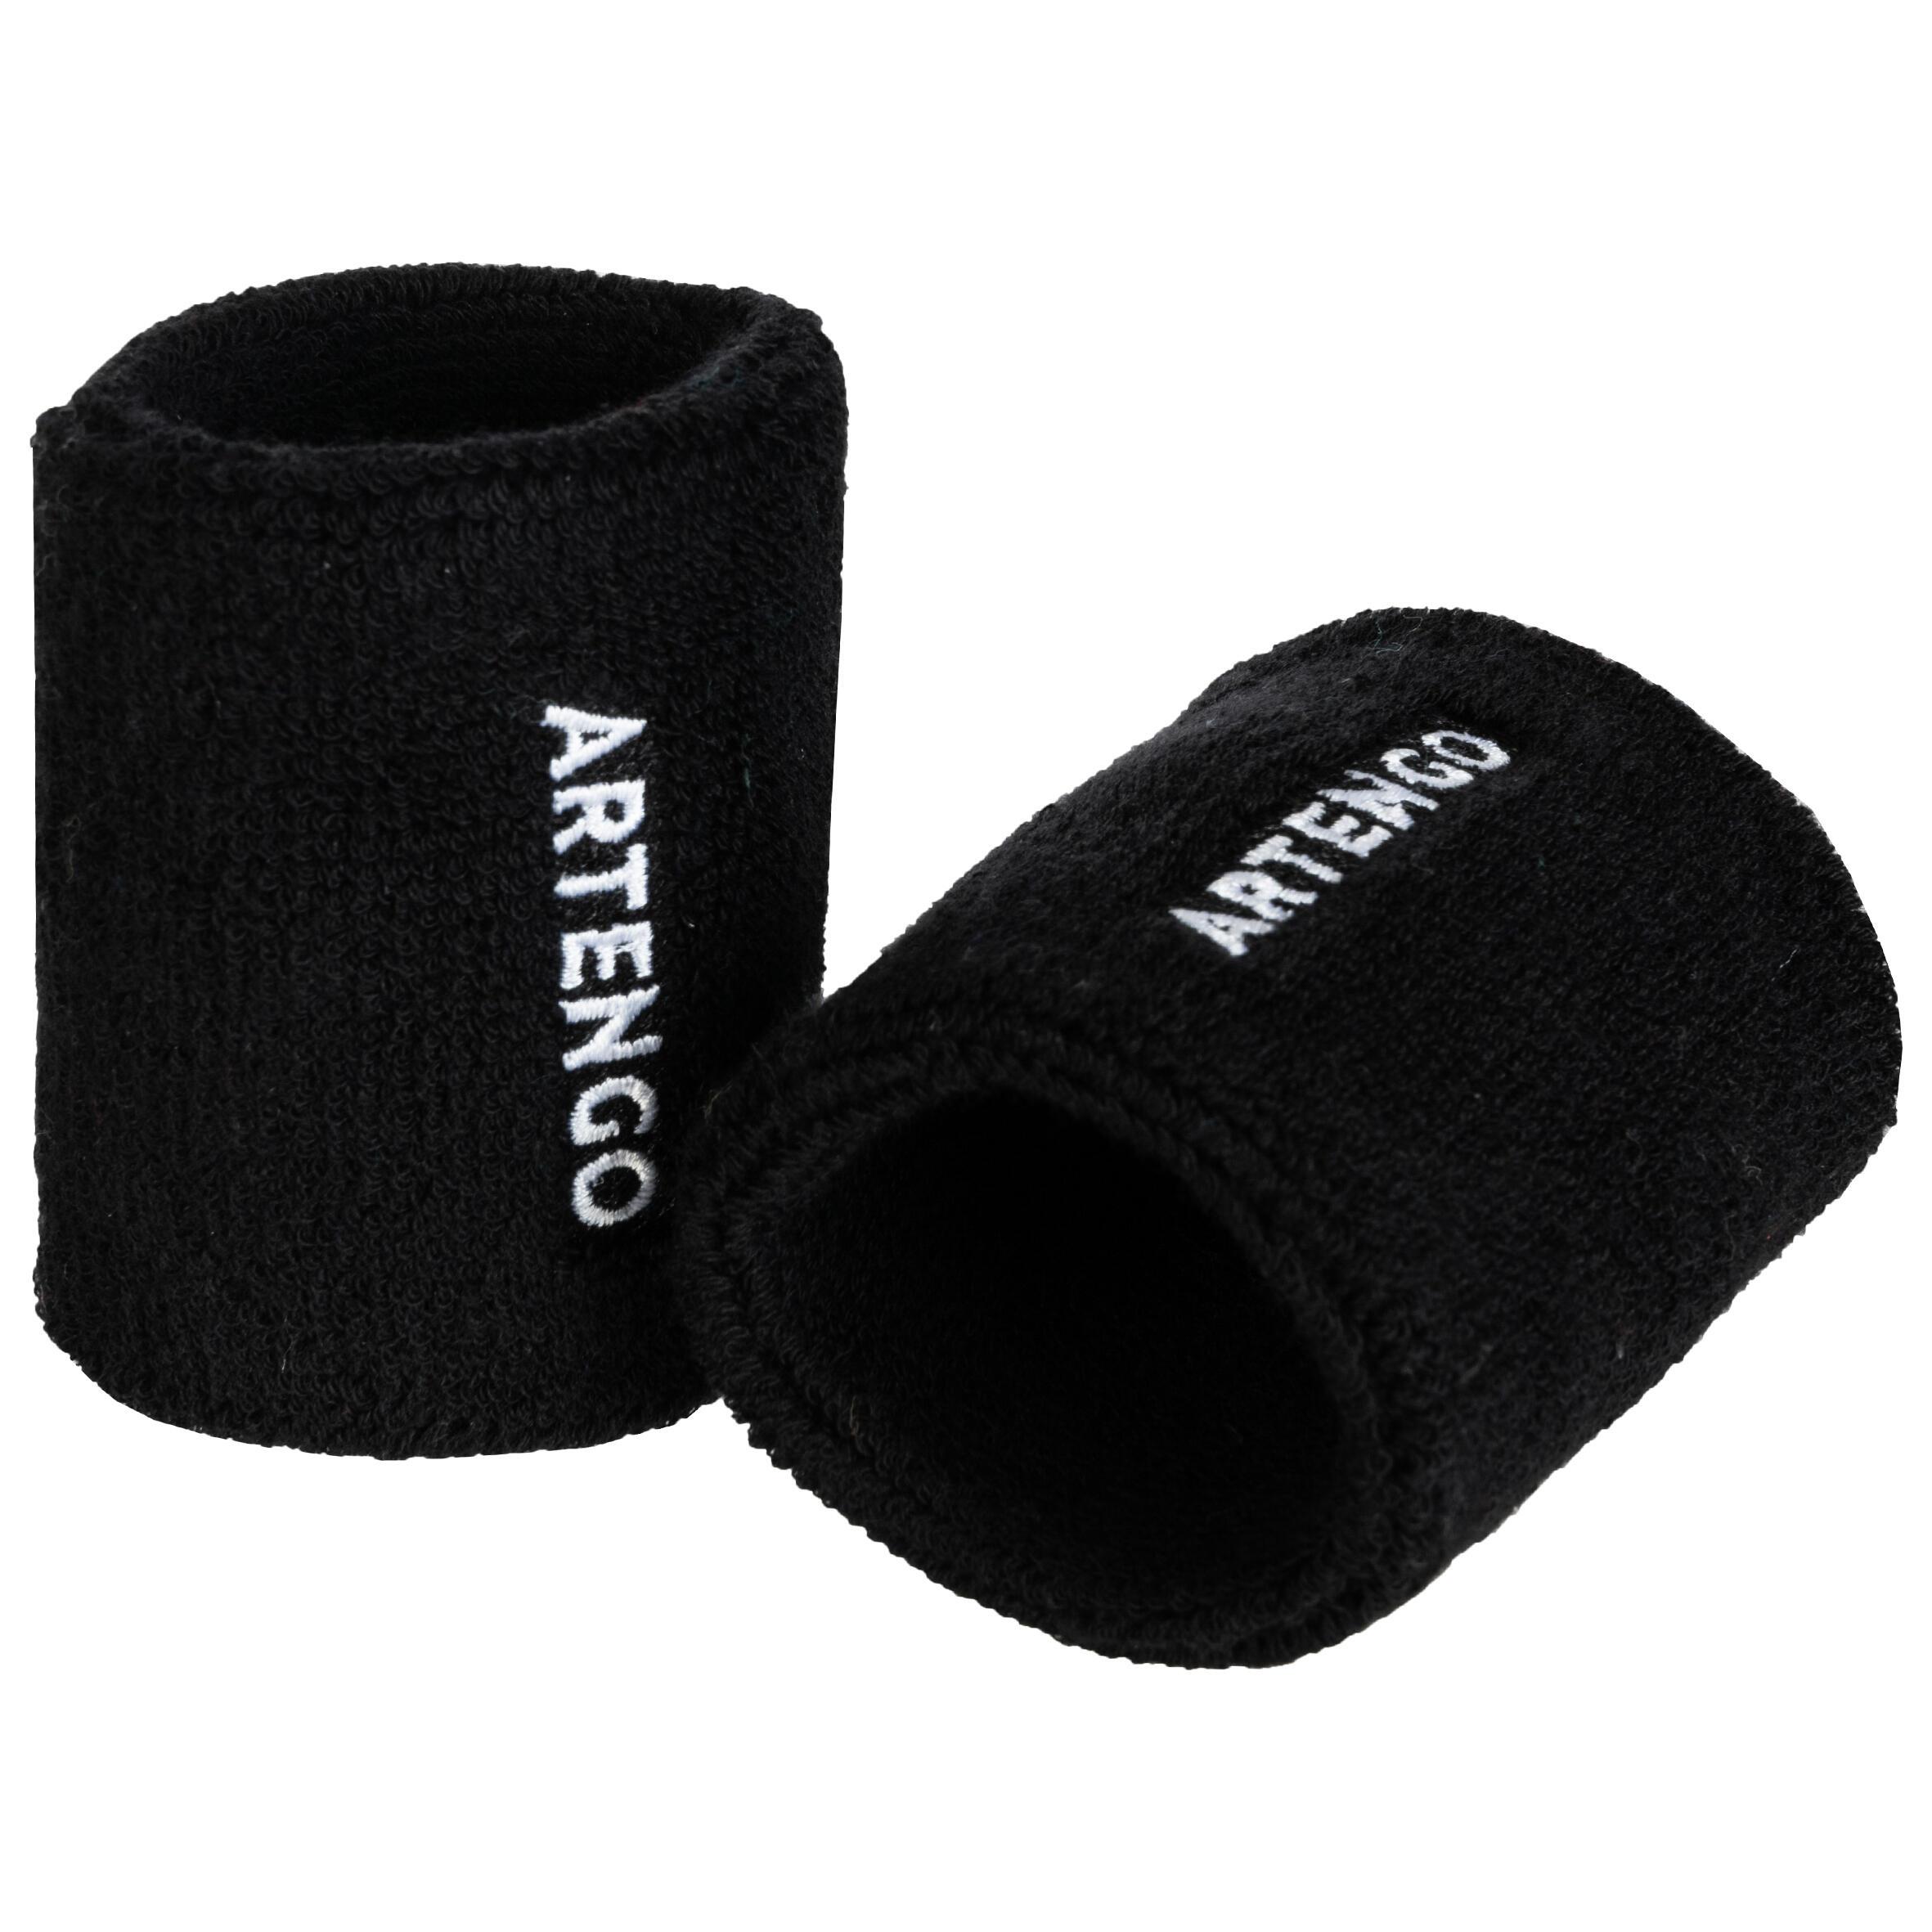 700 Sports Wristband - Black